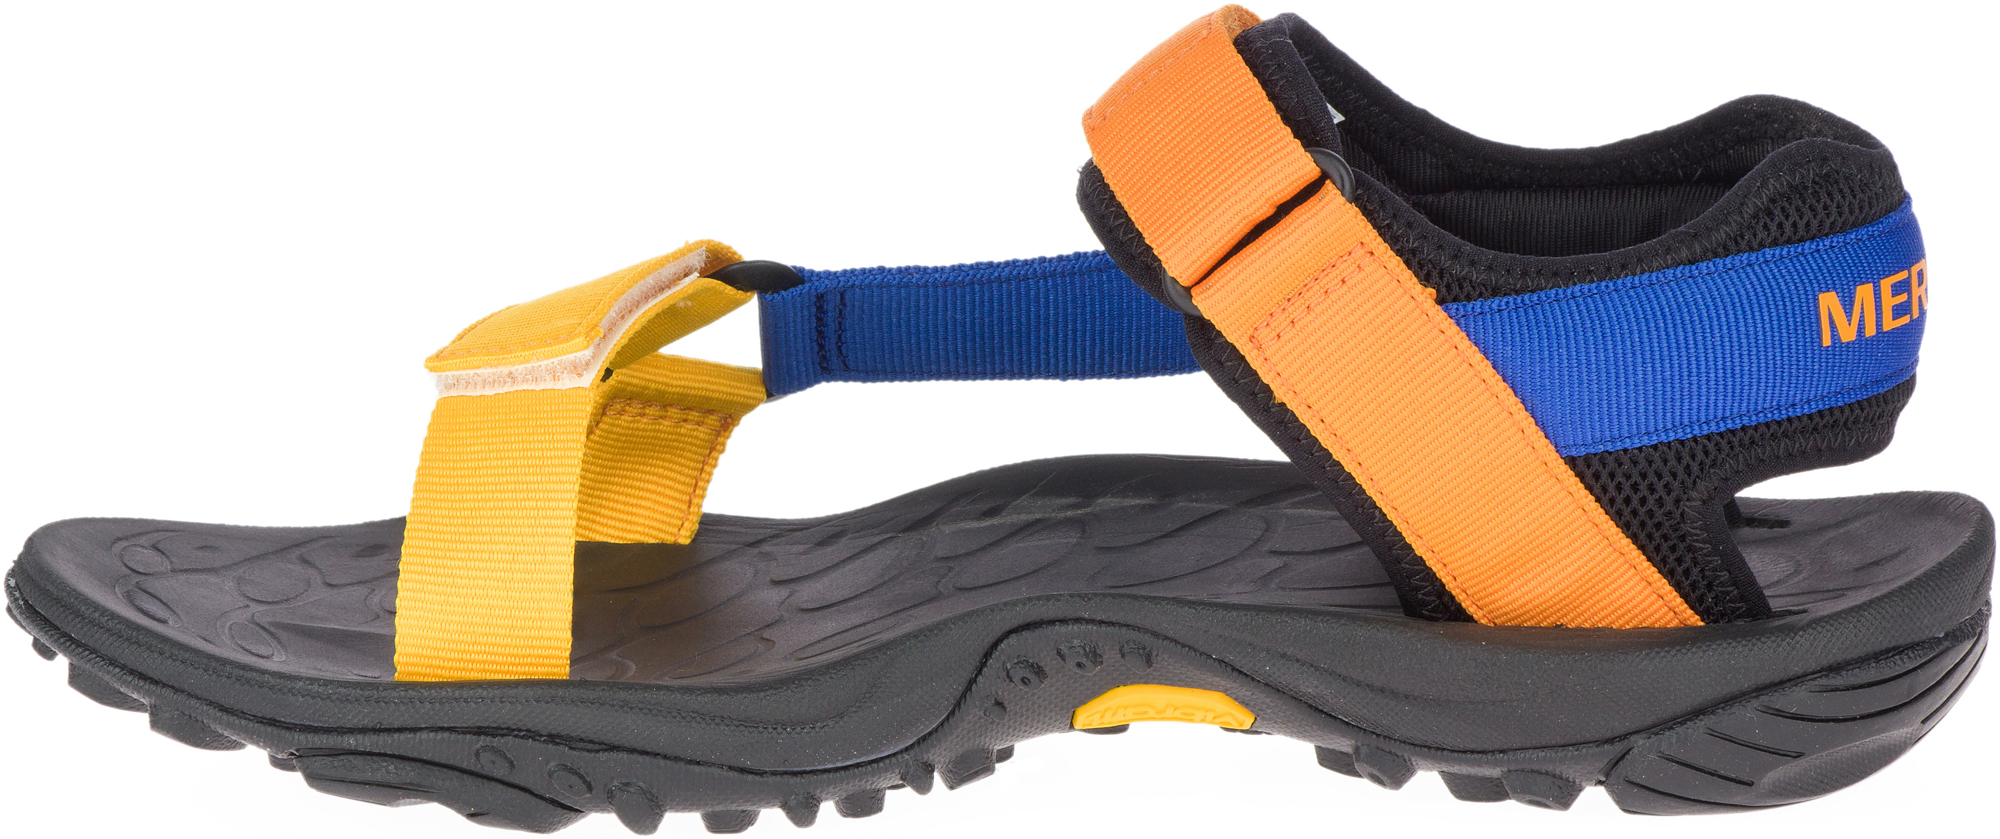 Merrell J000789-. 12 Сандалии мужские KAHUNA WEB голубой/оранжевый р. 12, размер 42 цена